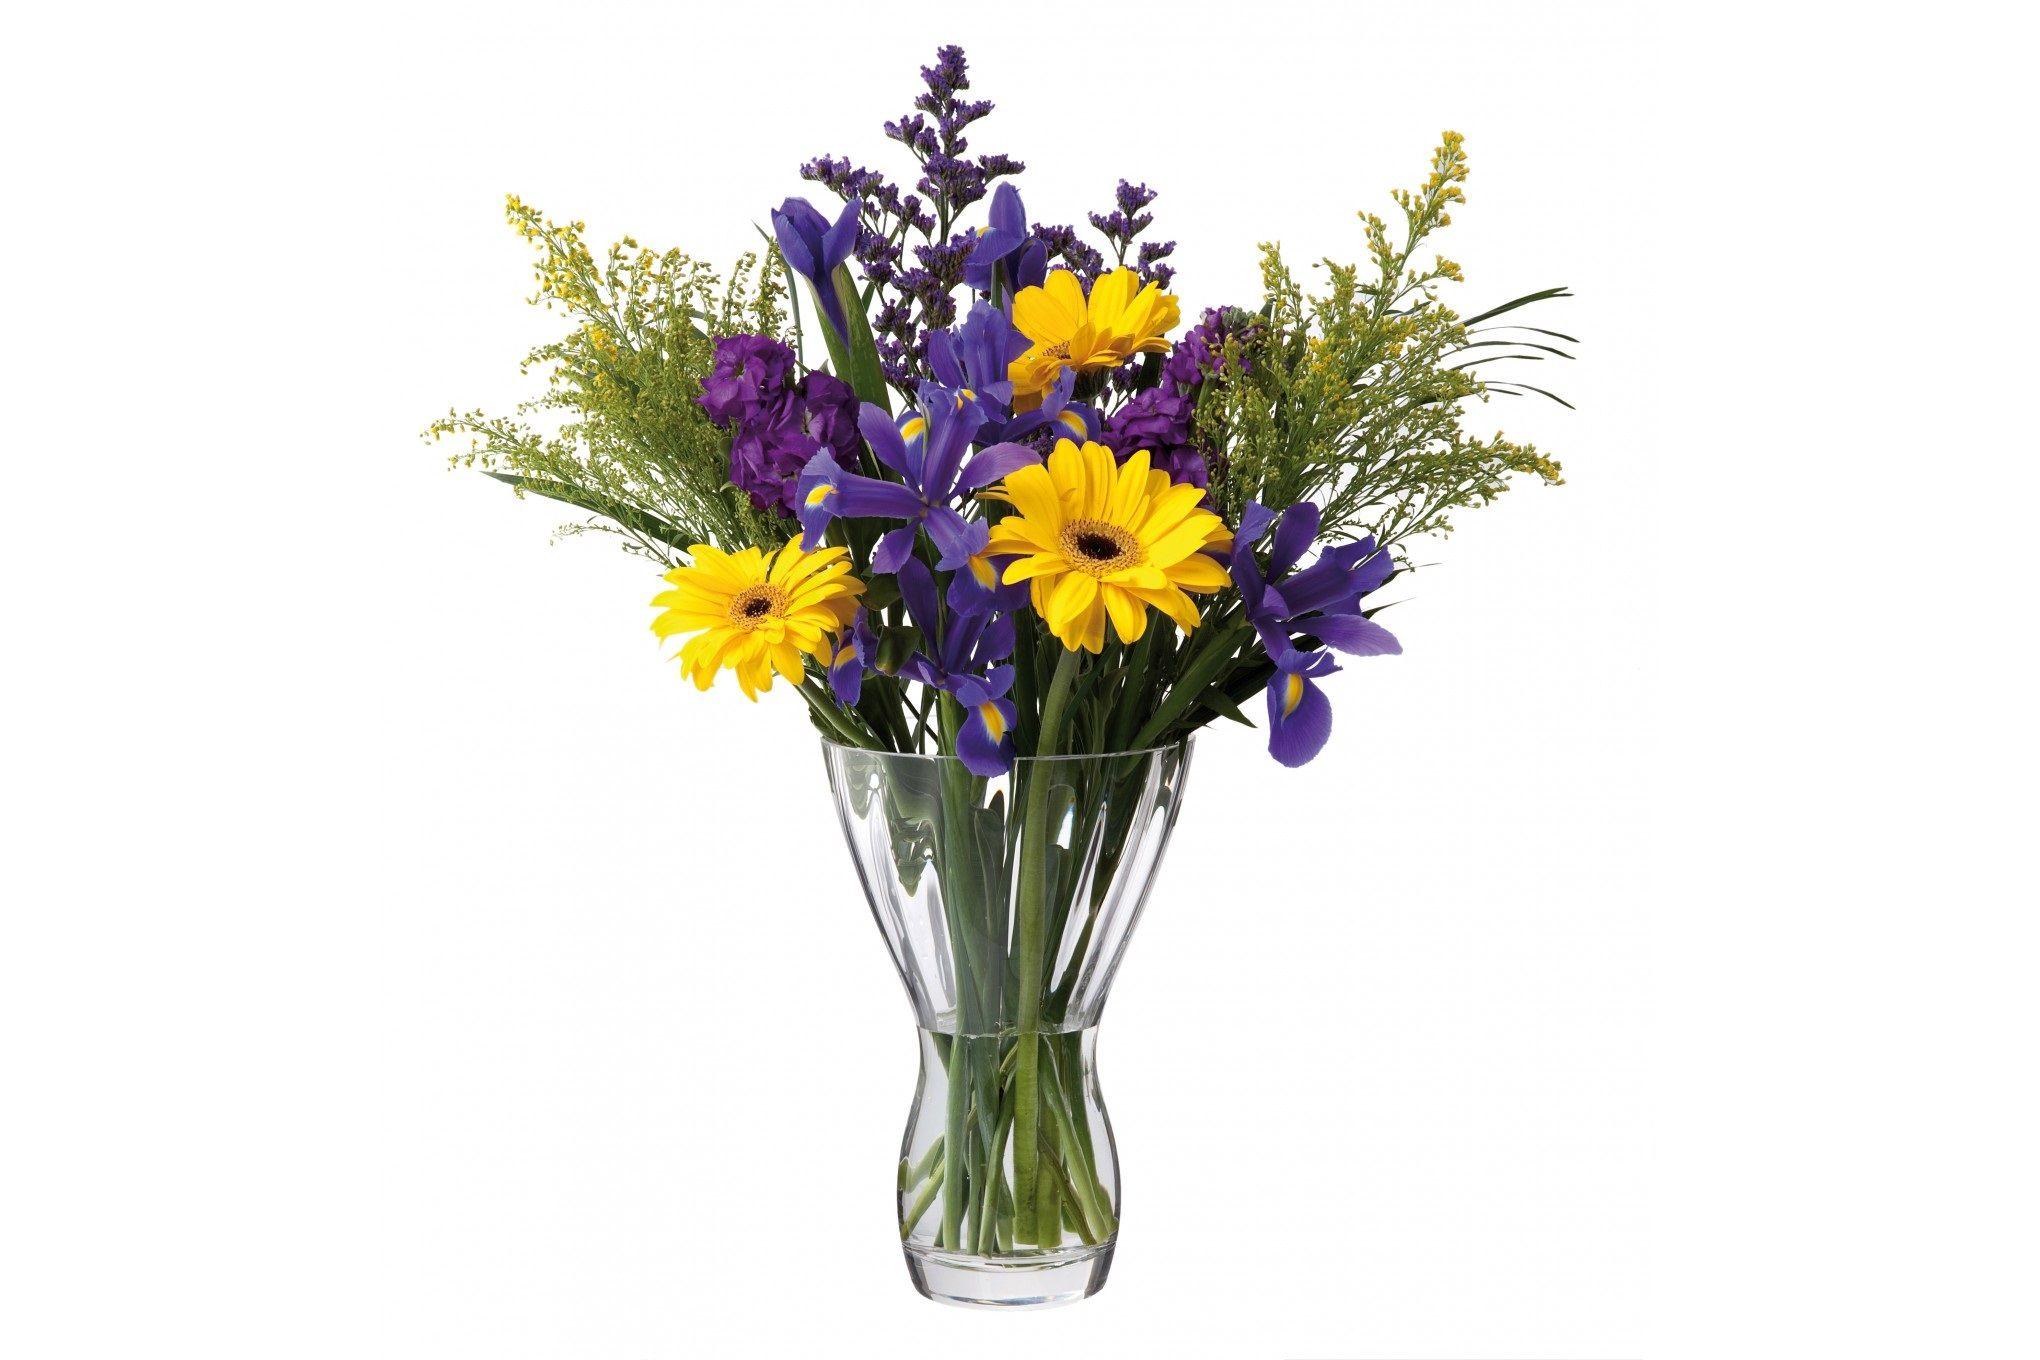 Dartington Crystal Florabundance Vase Bouquet Vase thumb 1